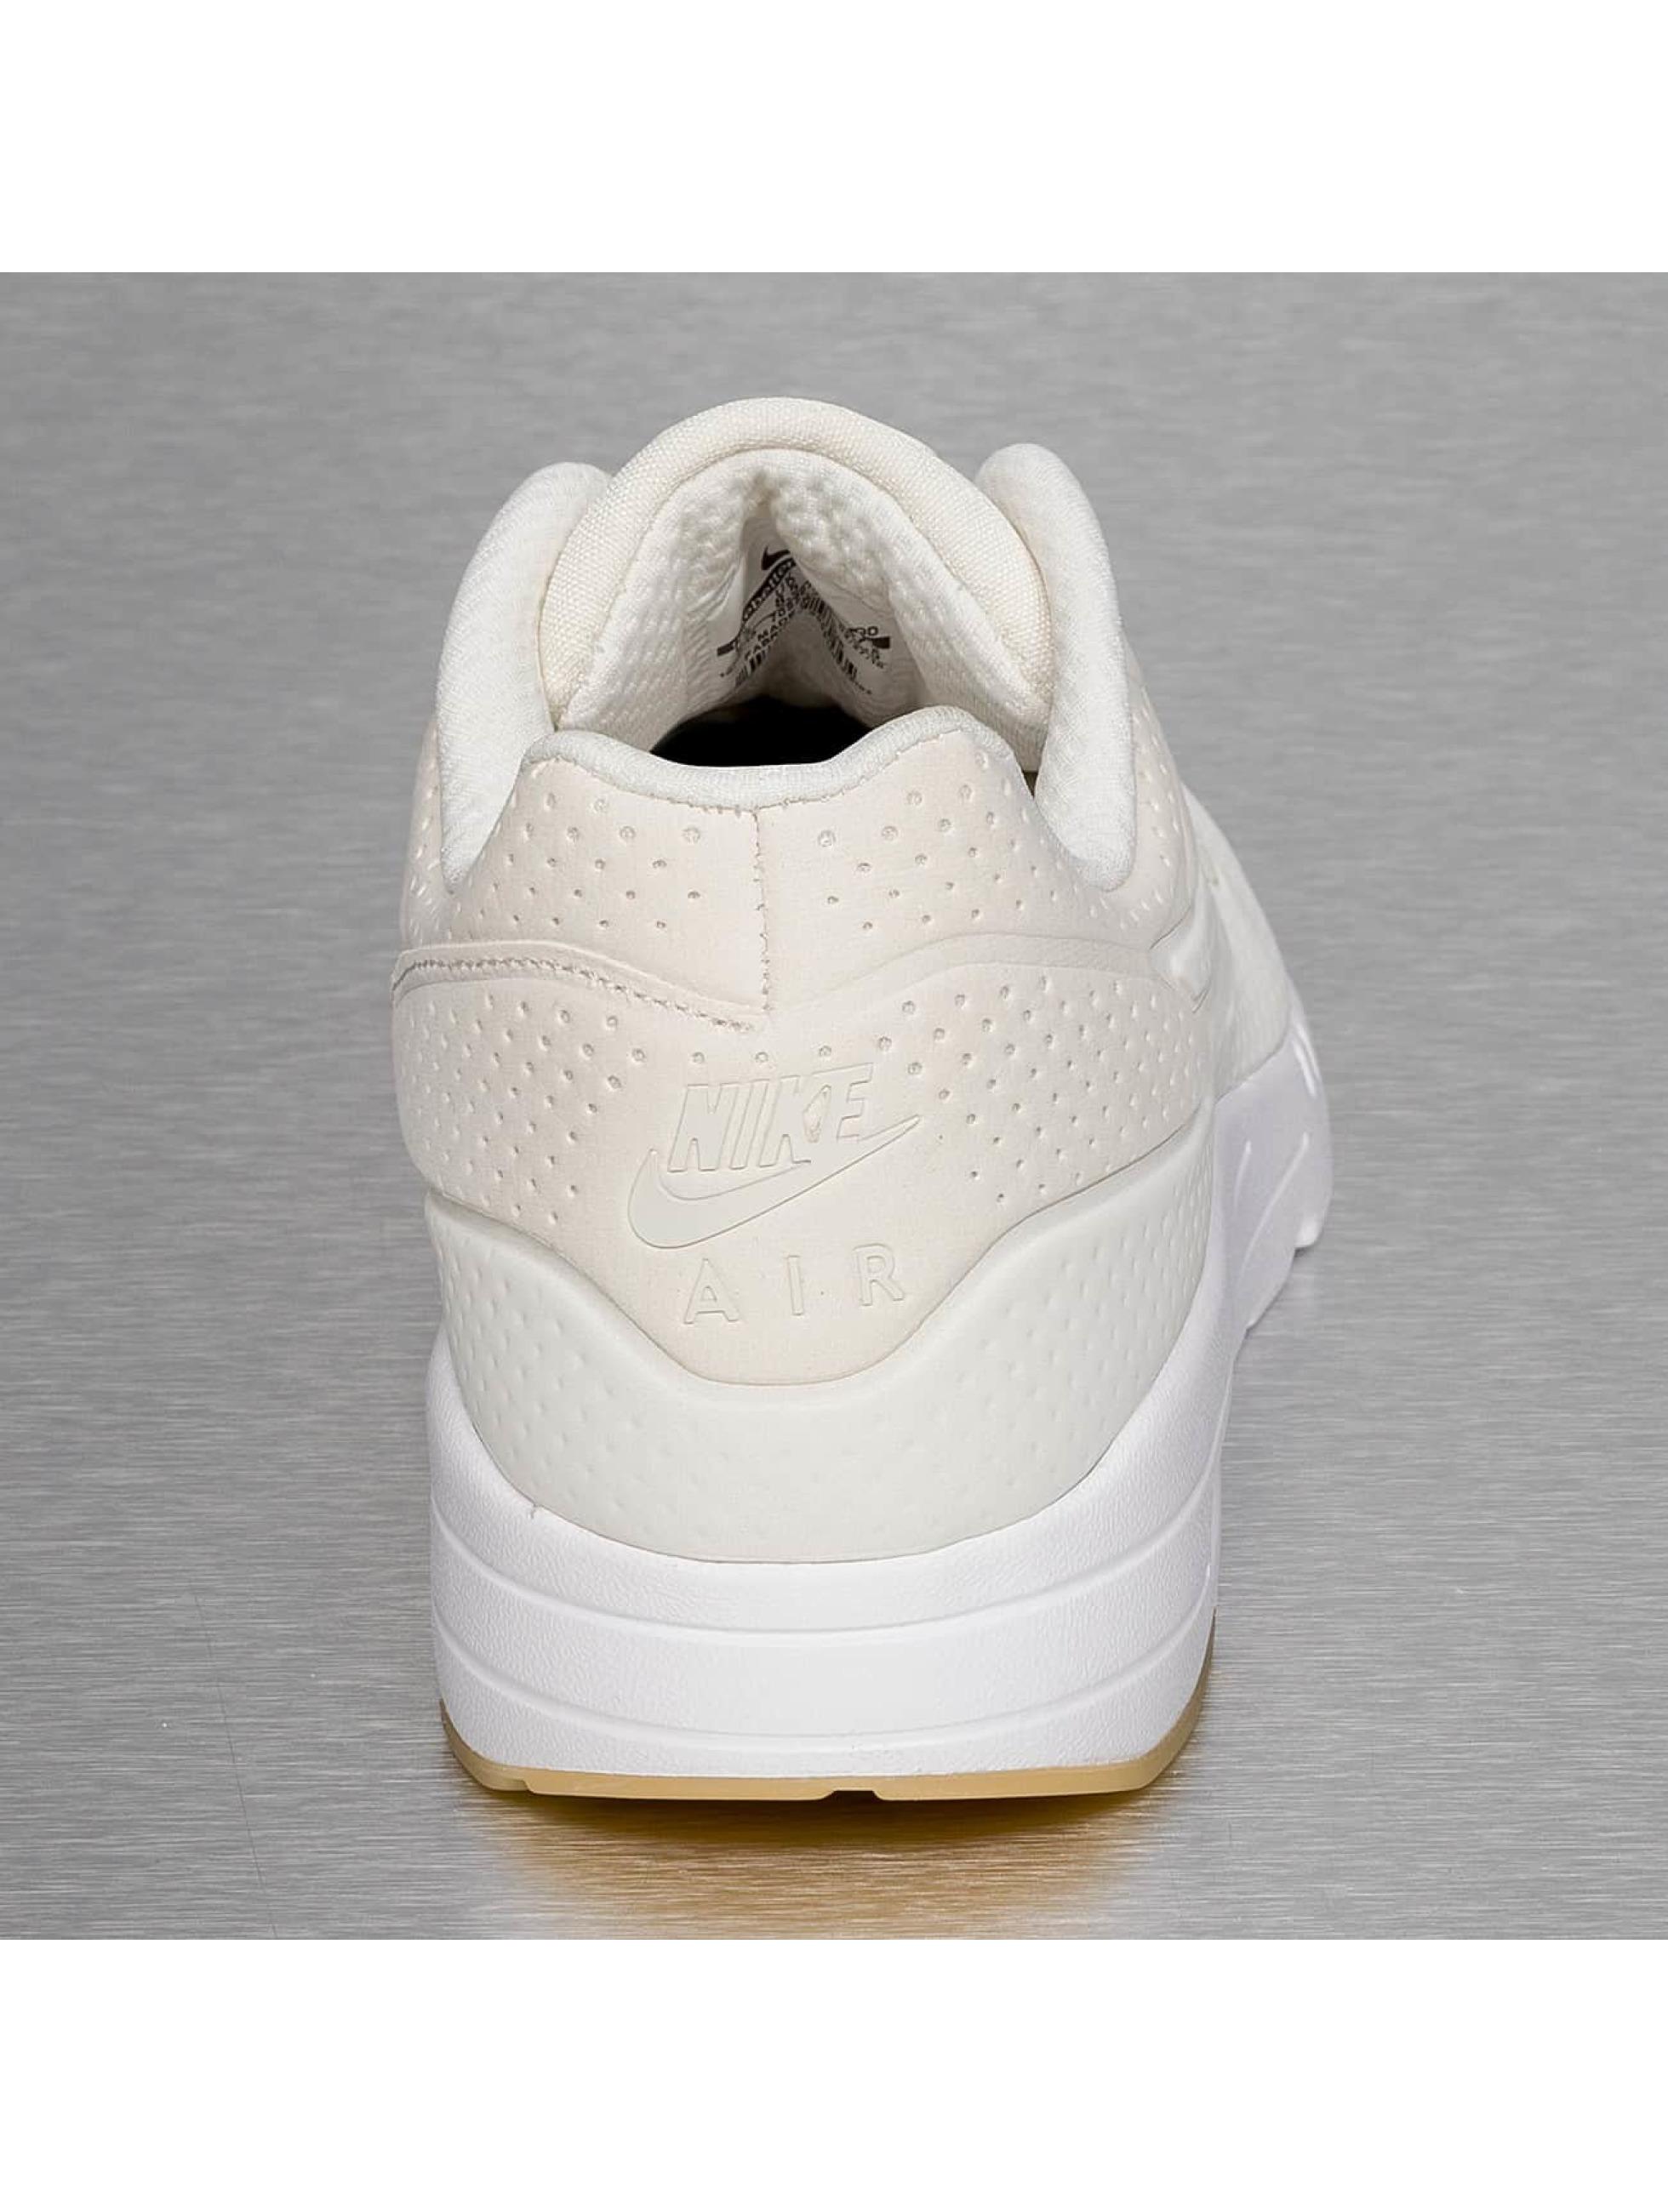 nike shox livrer brun - Nike Chaussures / Baskets Air Max 1 Ultra Moire en beige 241272